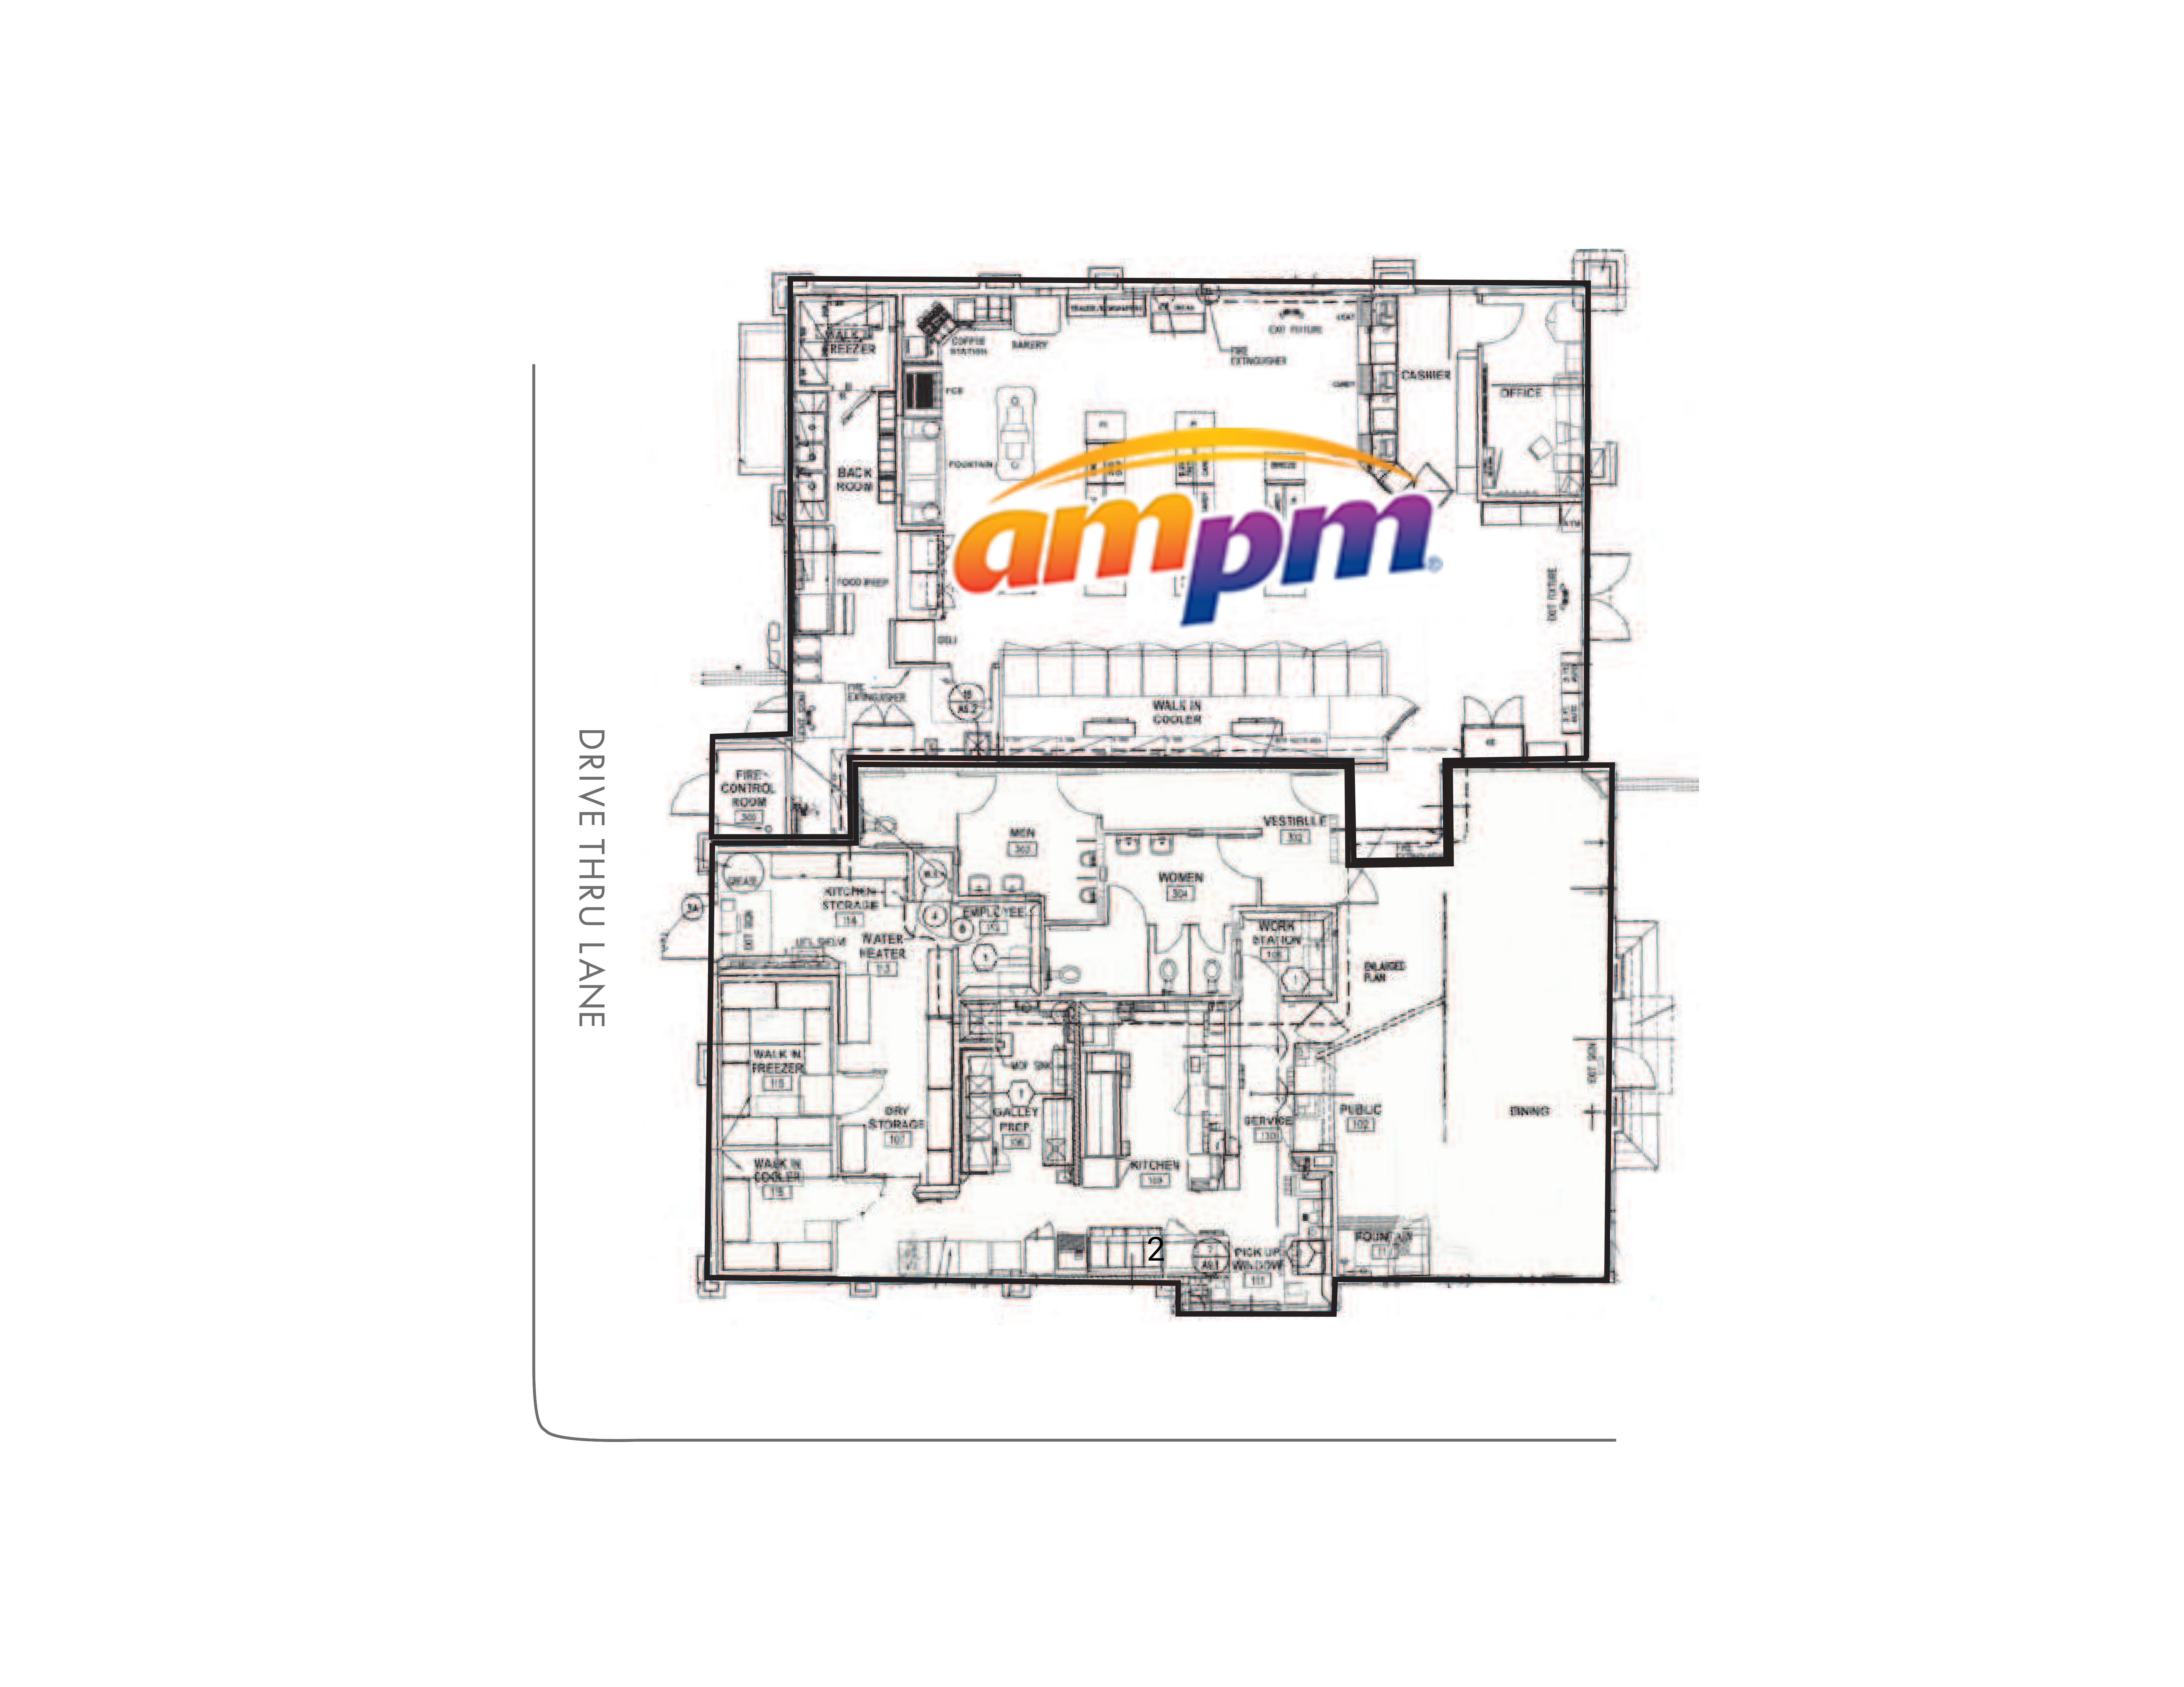 2990 Foothills Boulevard: site plan